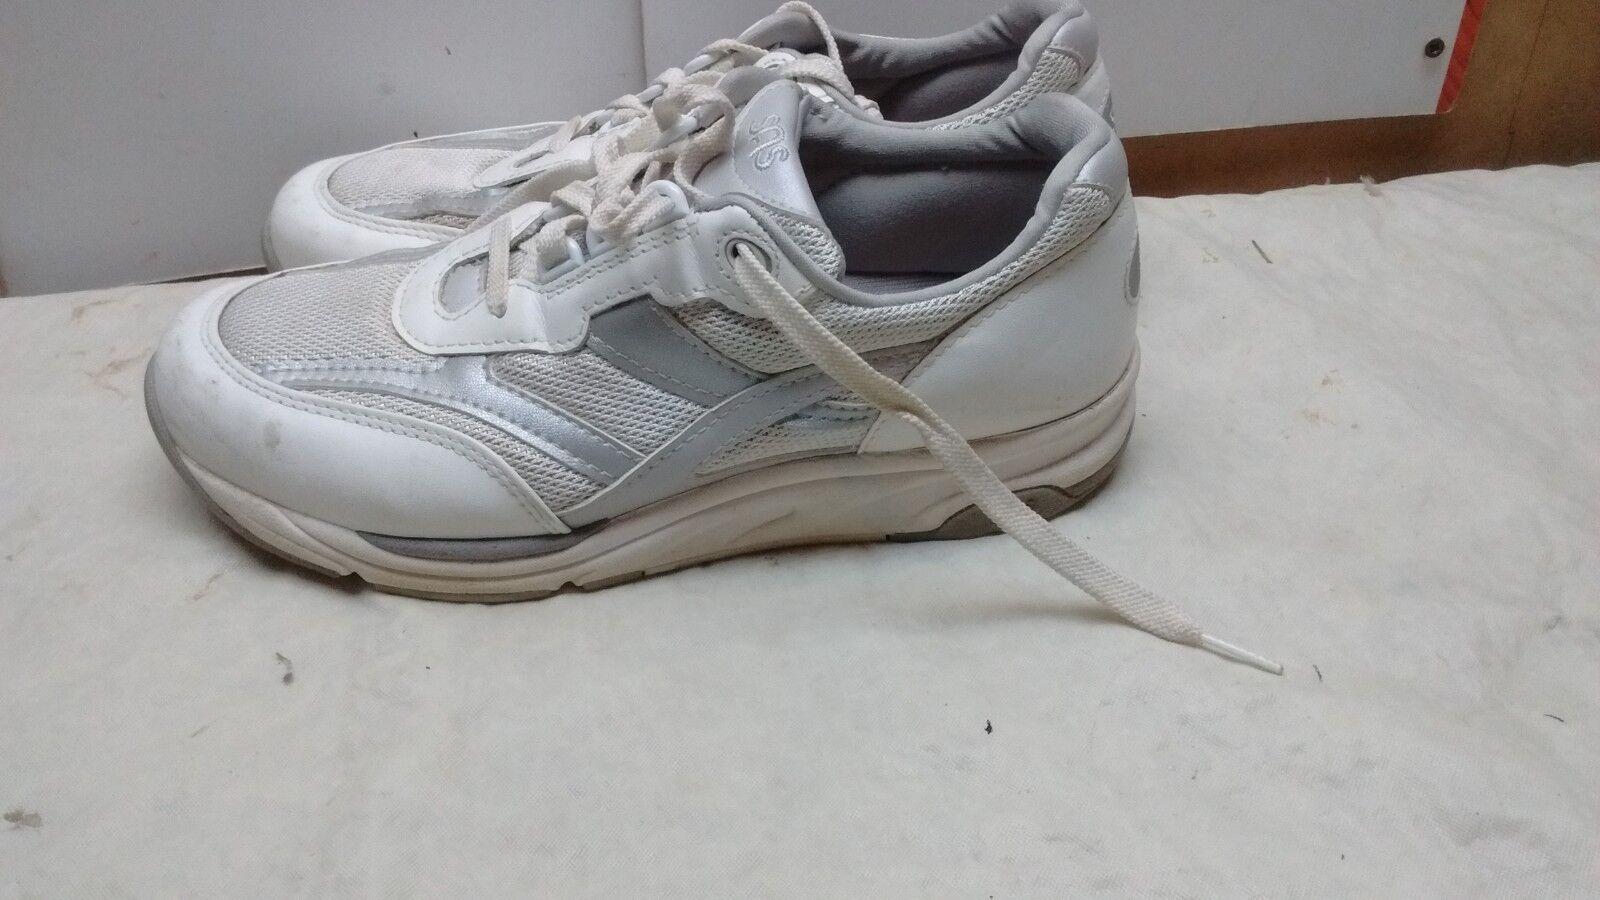 SAS Tri Pad Comfort Women Leather White Lace Up Sport Sneaker Walking shoes 8.5M